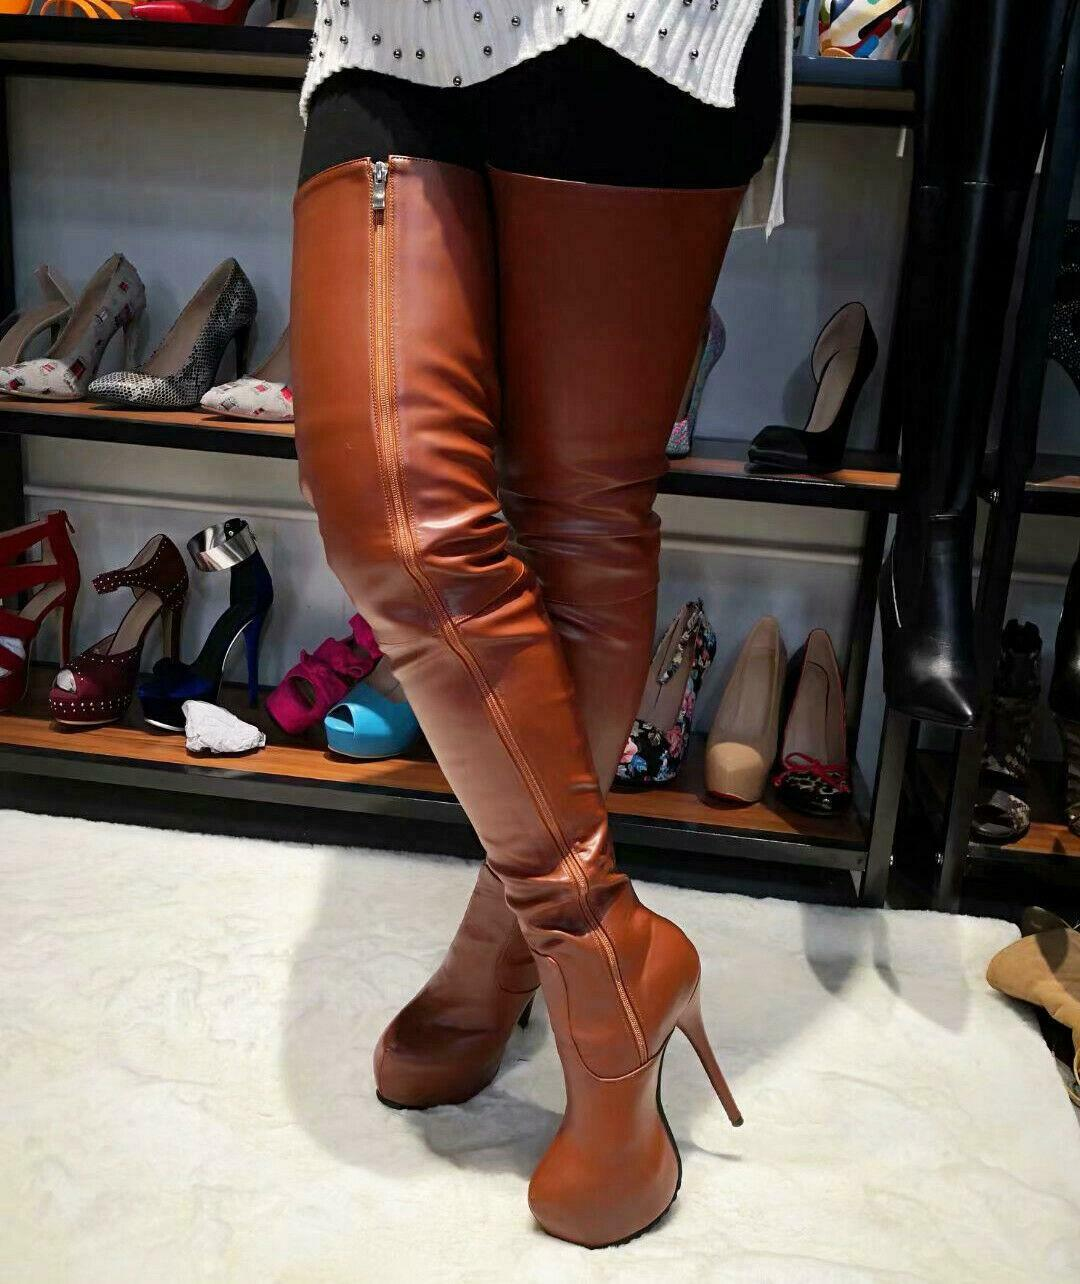 donna SUPER Woman Thigh High stivali Platform Leather High  Heels stivali scarpe 4 -20  grande sconto